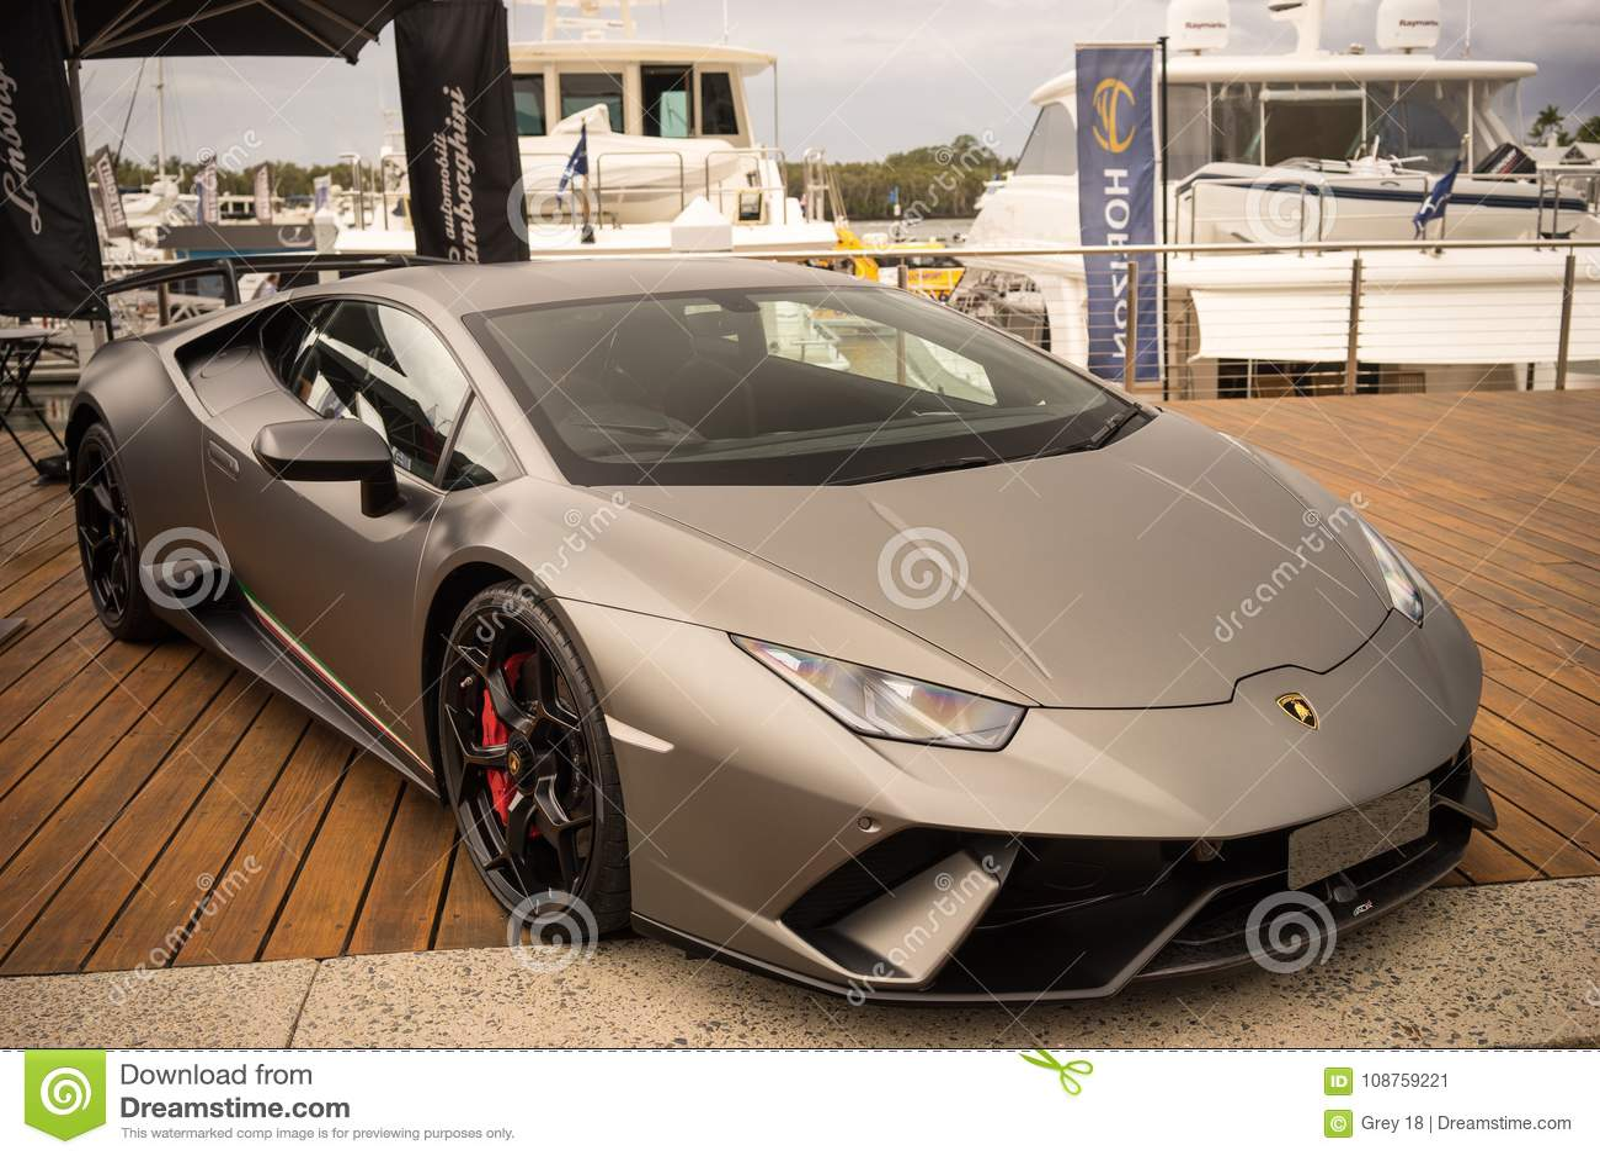 Lamborghini Huracan Lp640 Performante Editorial Photo